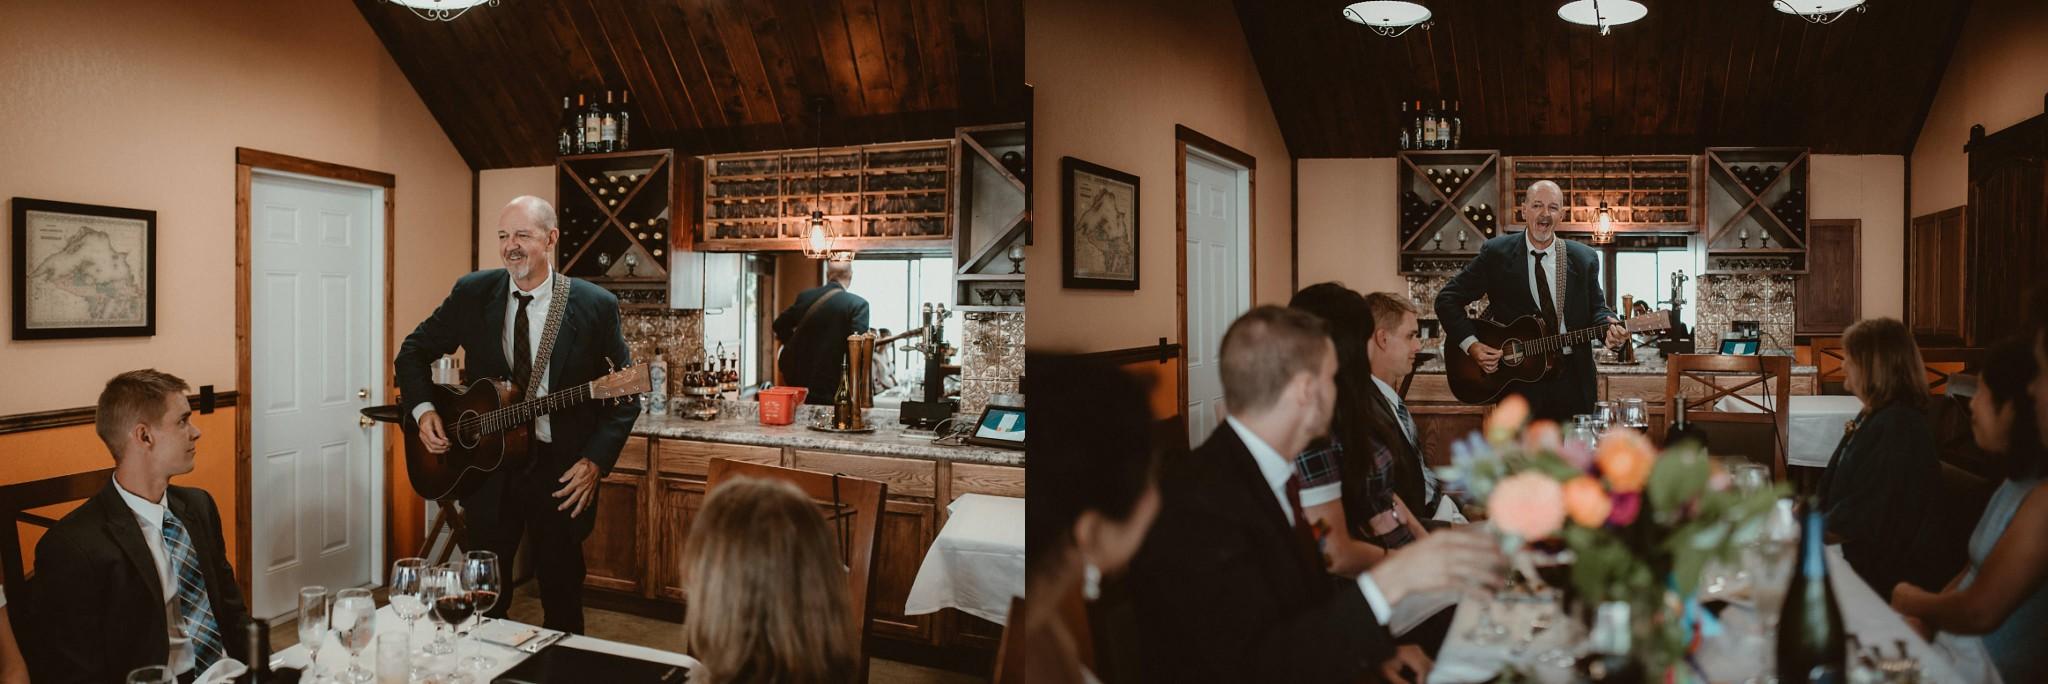 Wedding dinner at the Harbor Haus Restaurant in Copper Harbor